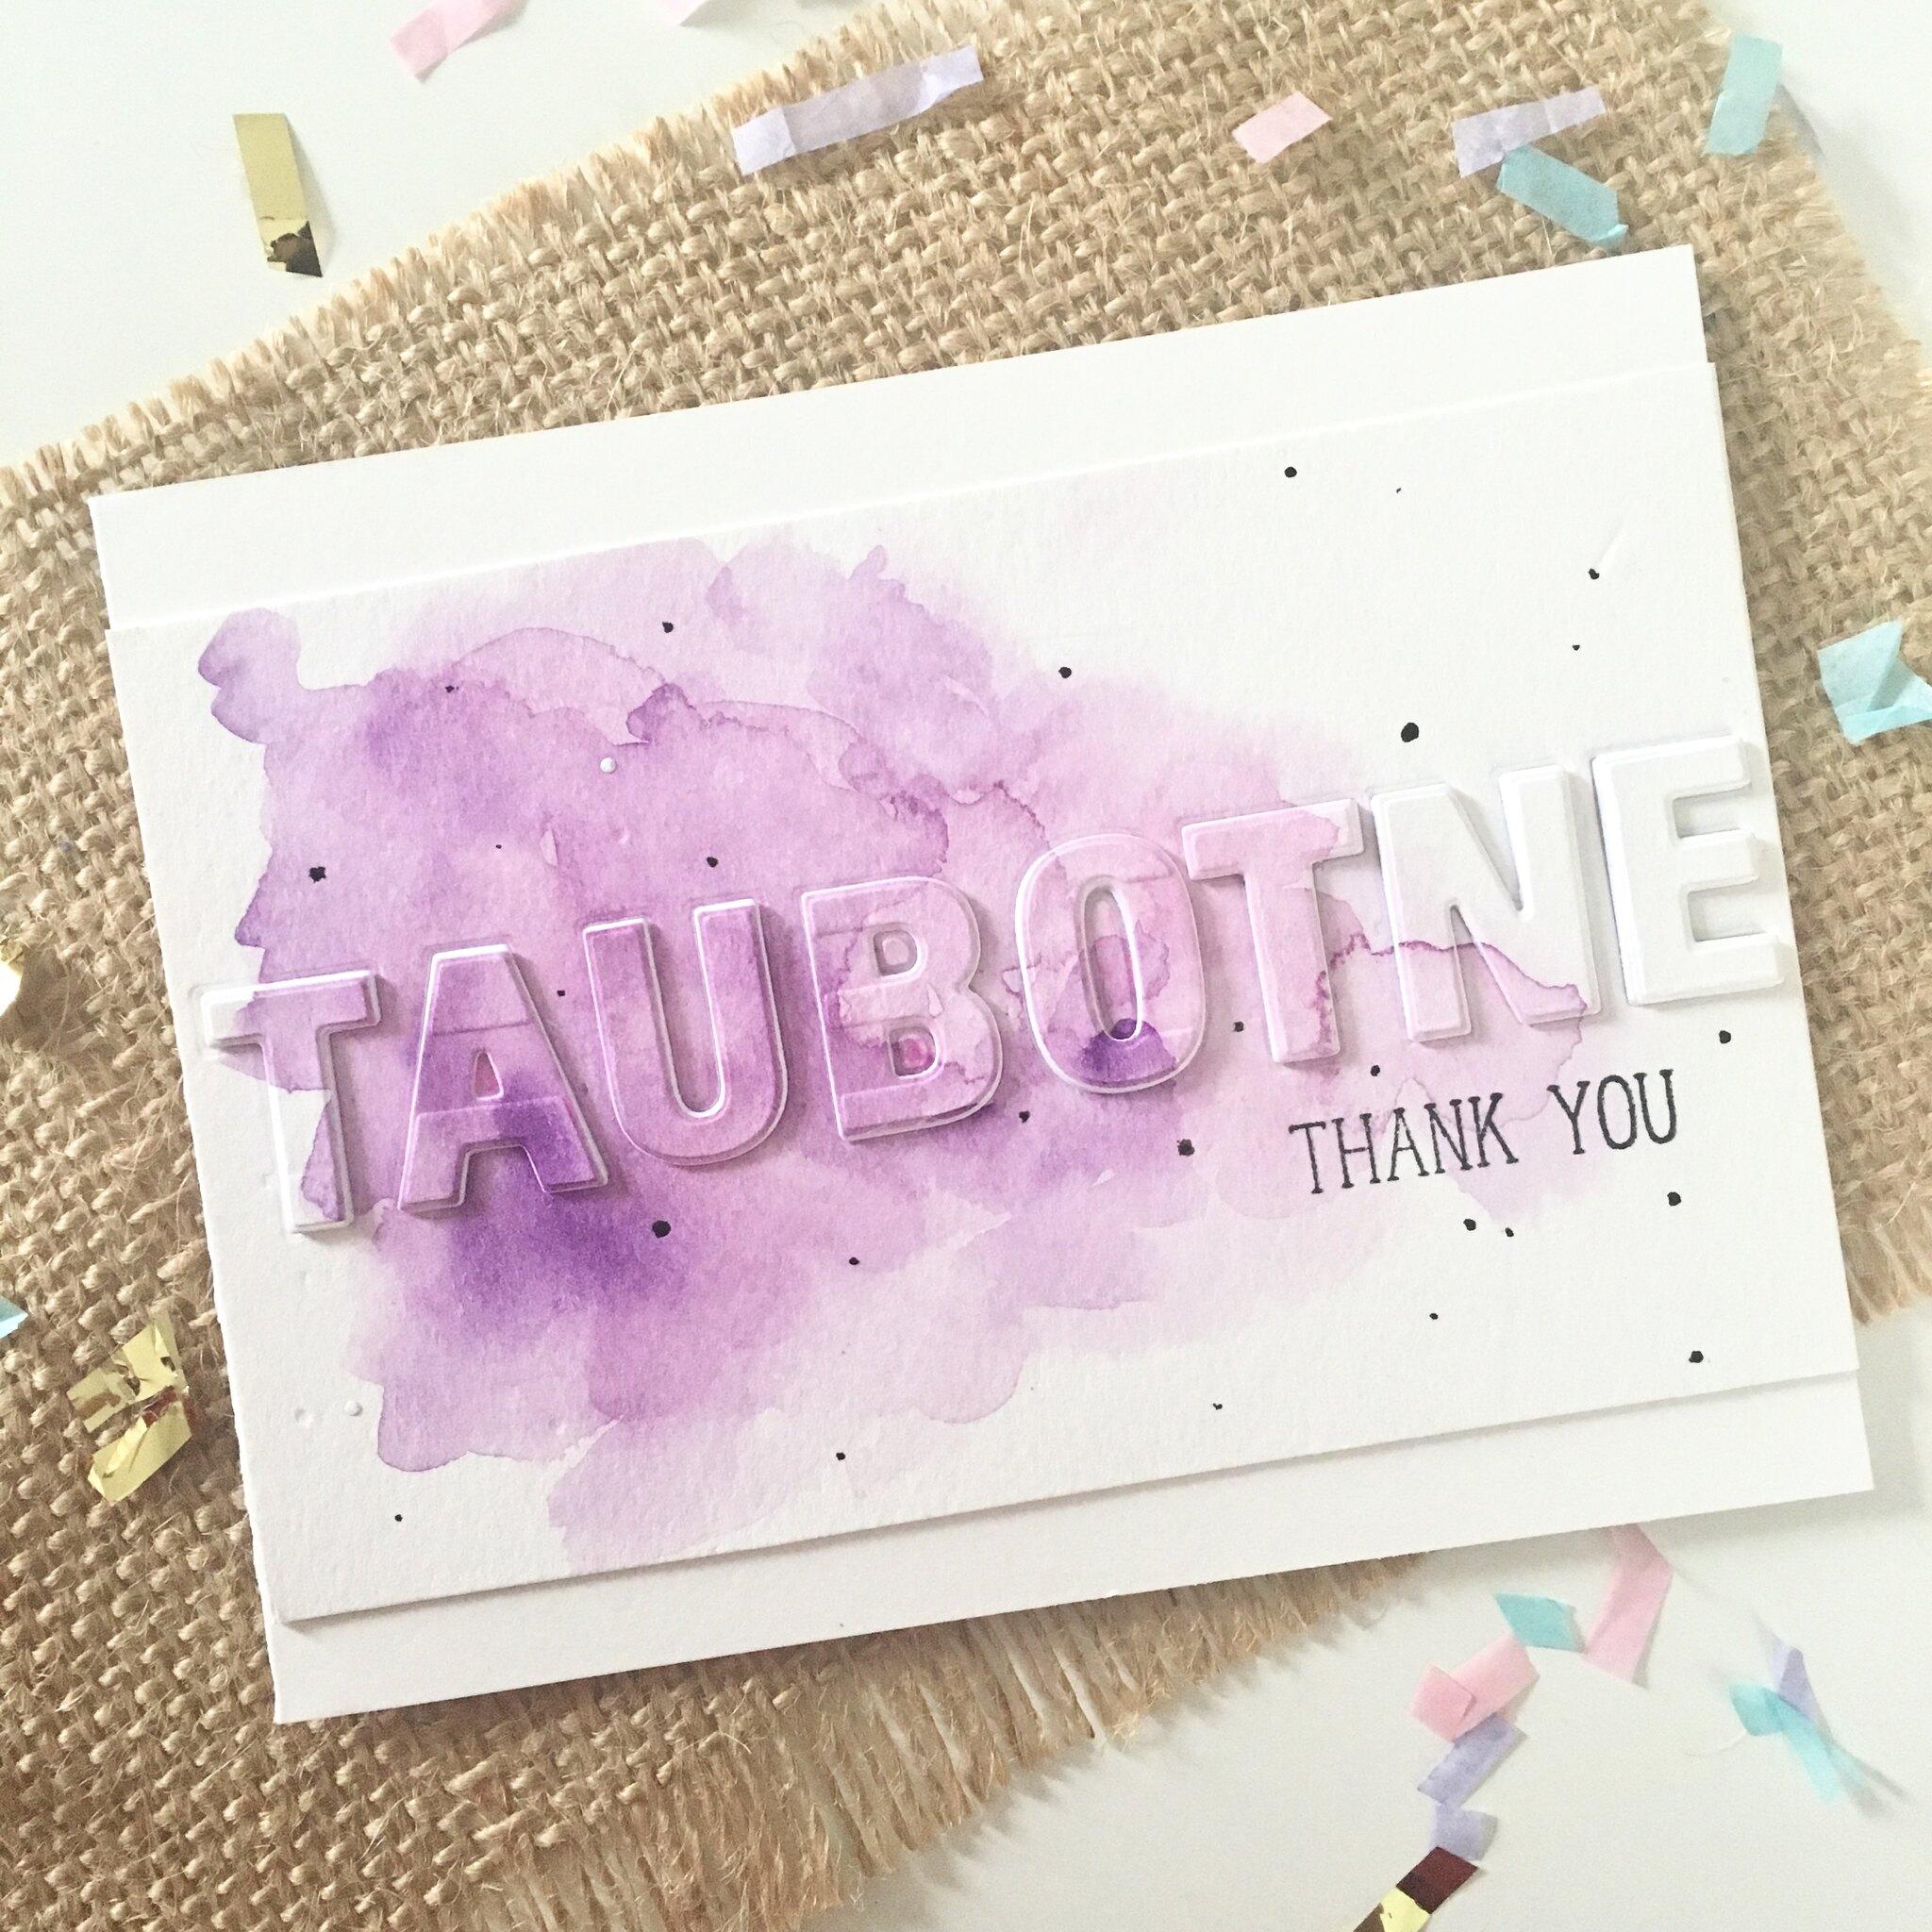 Taubotne